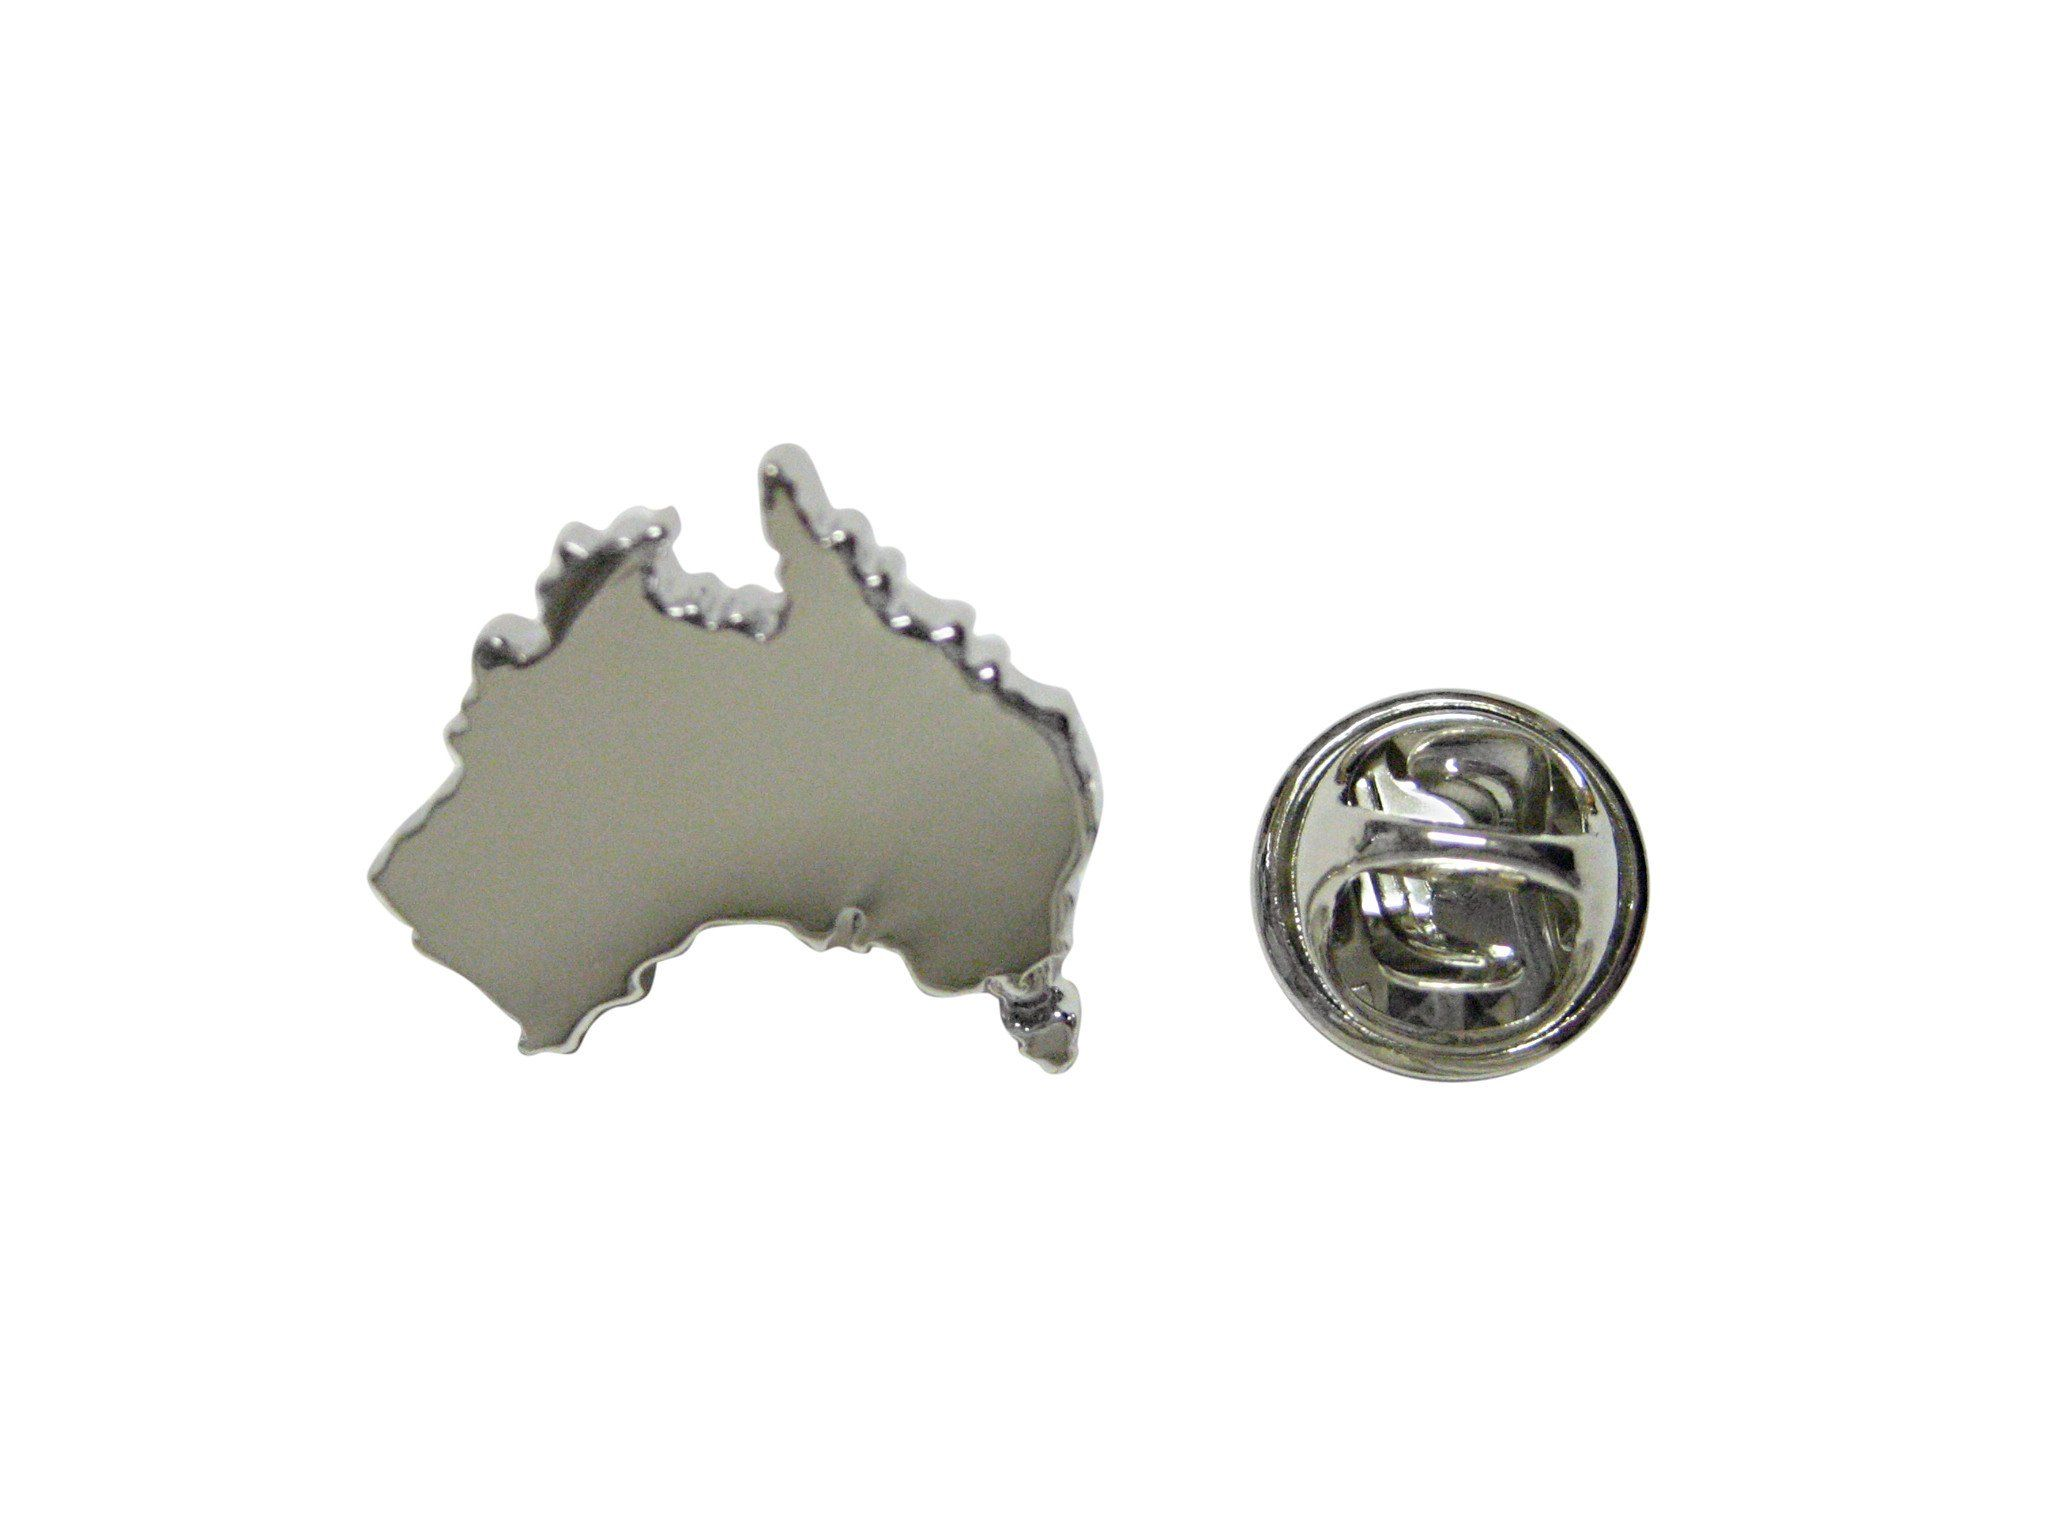 Australia Map Shape.Australia Map Shape Lapel Pin World Maps Lapel Pins Australia